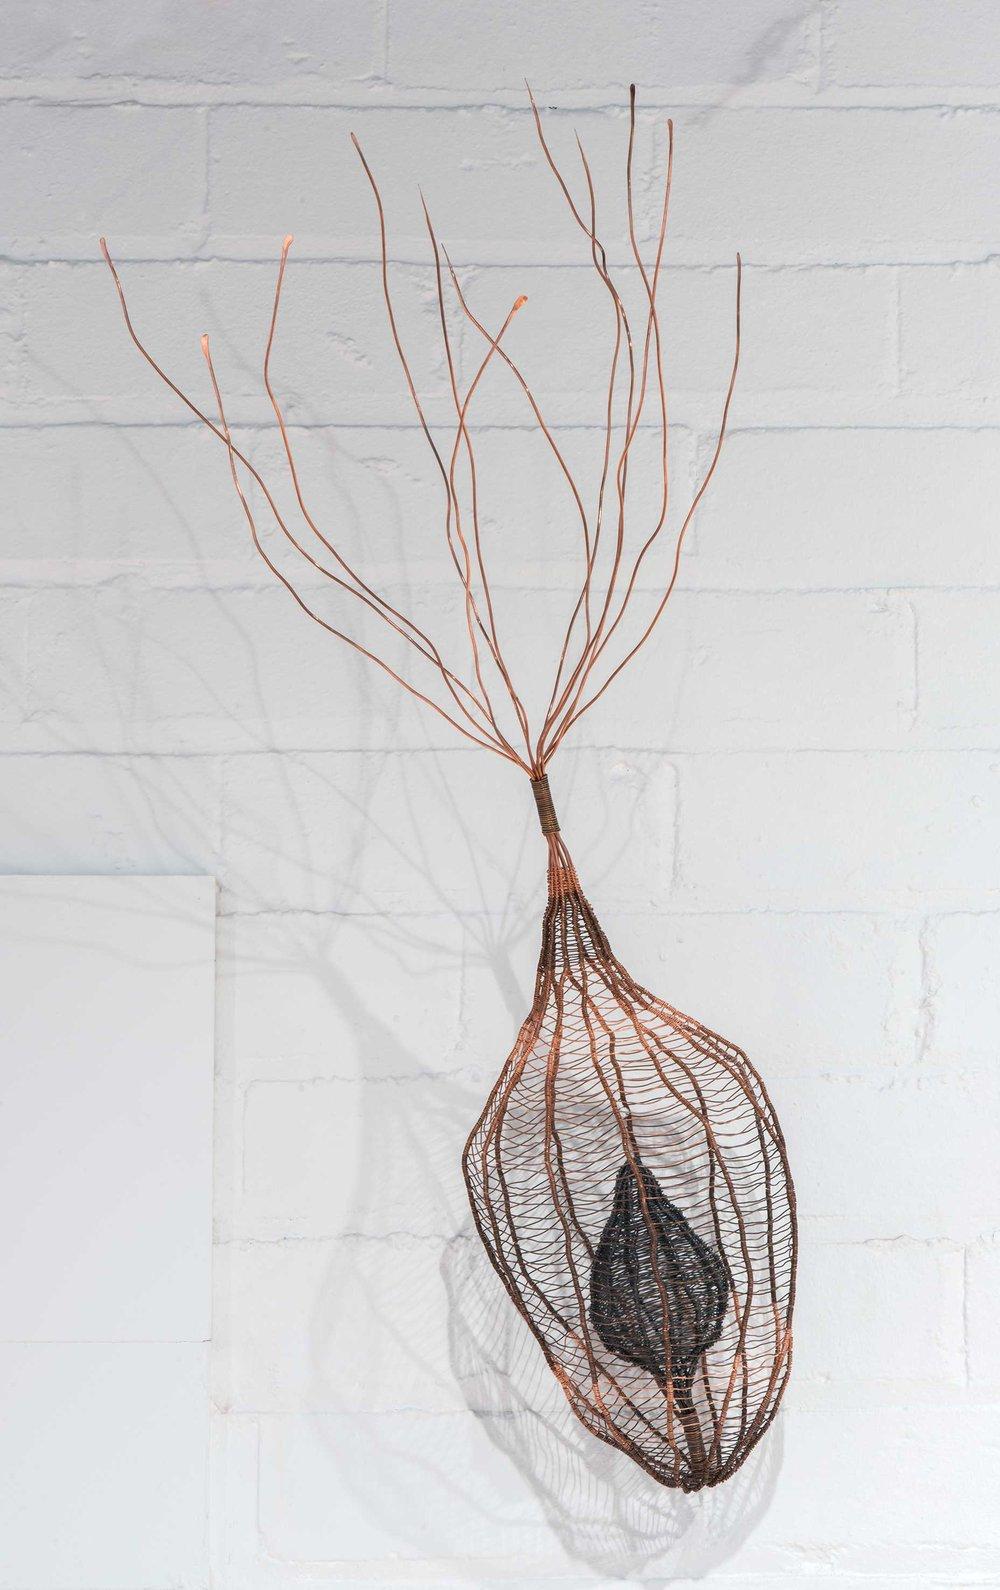 Regeneration,  patinated copper wire. Photo: Brenton McGeachie